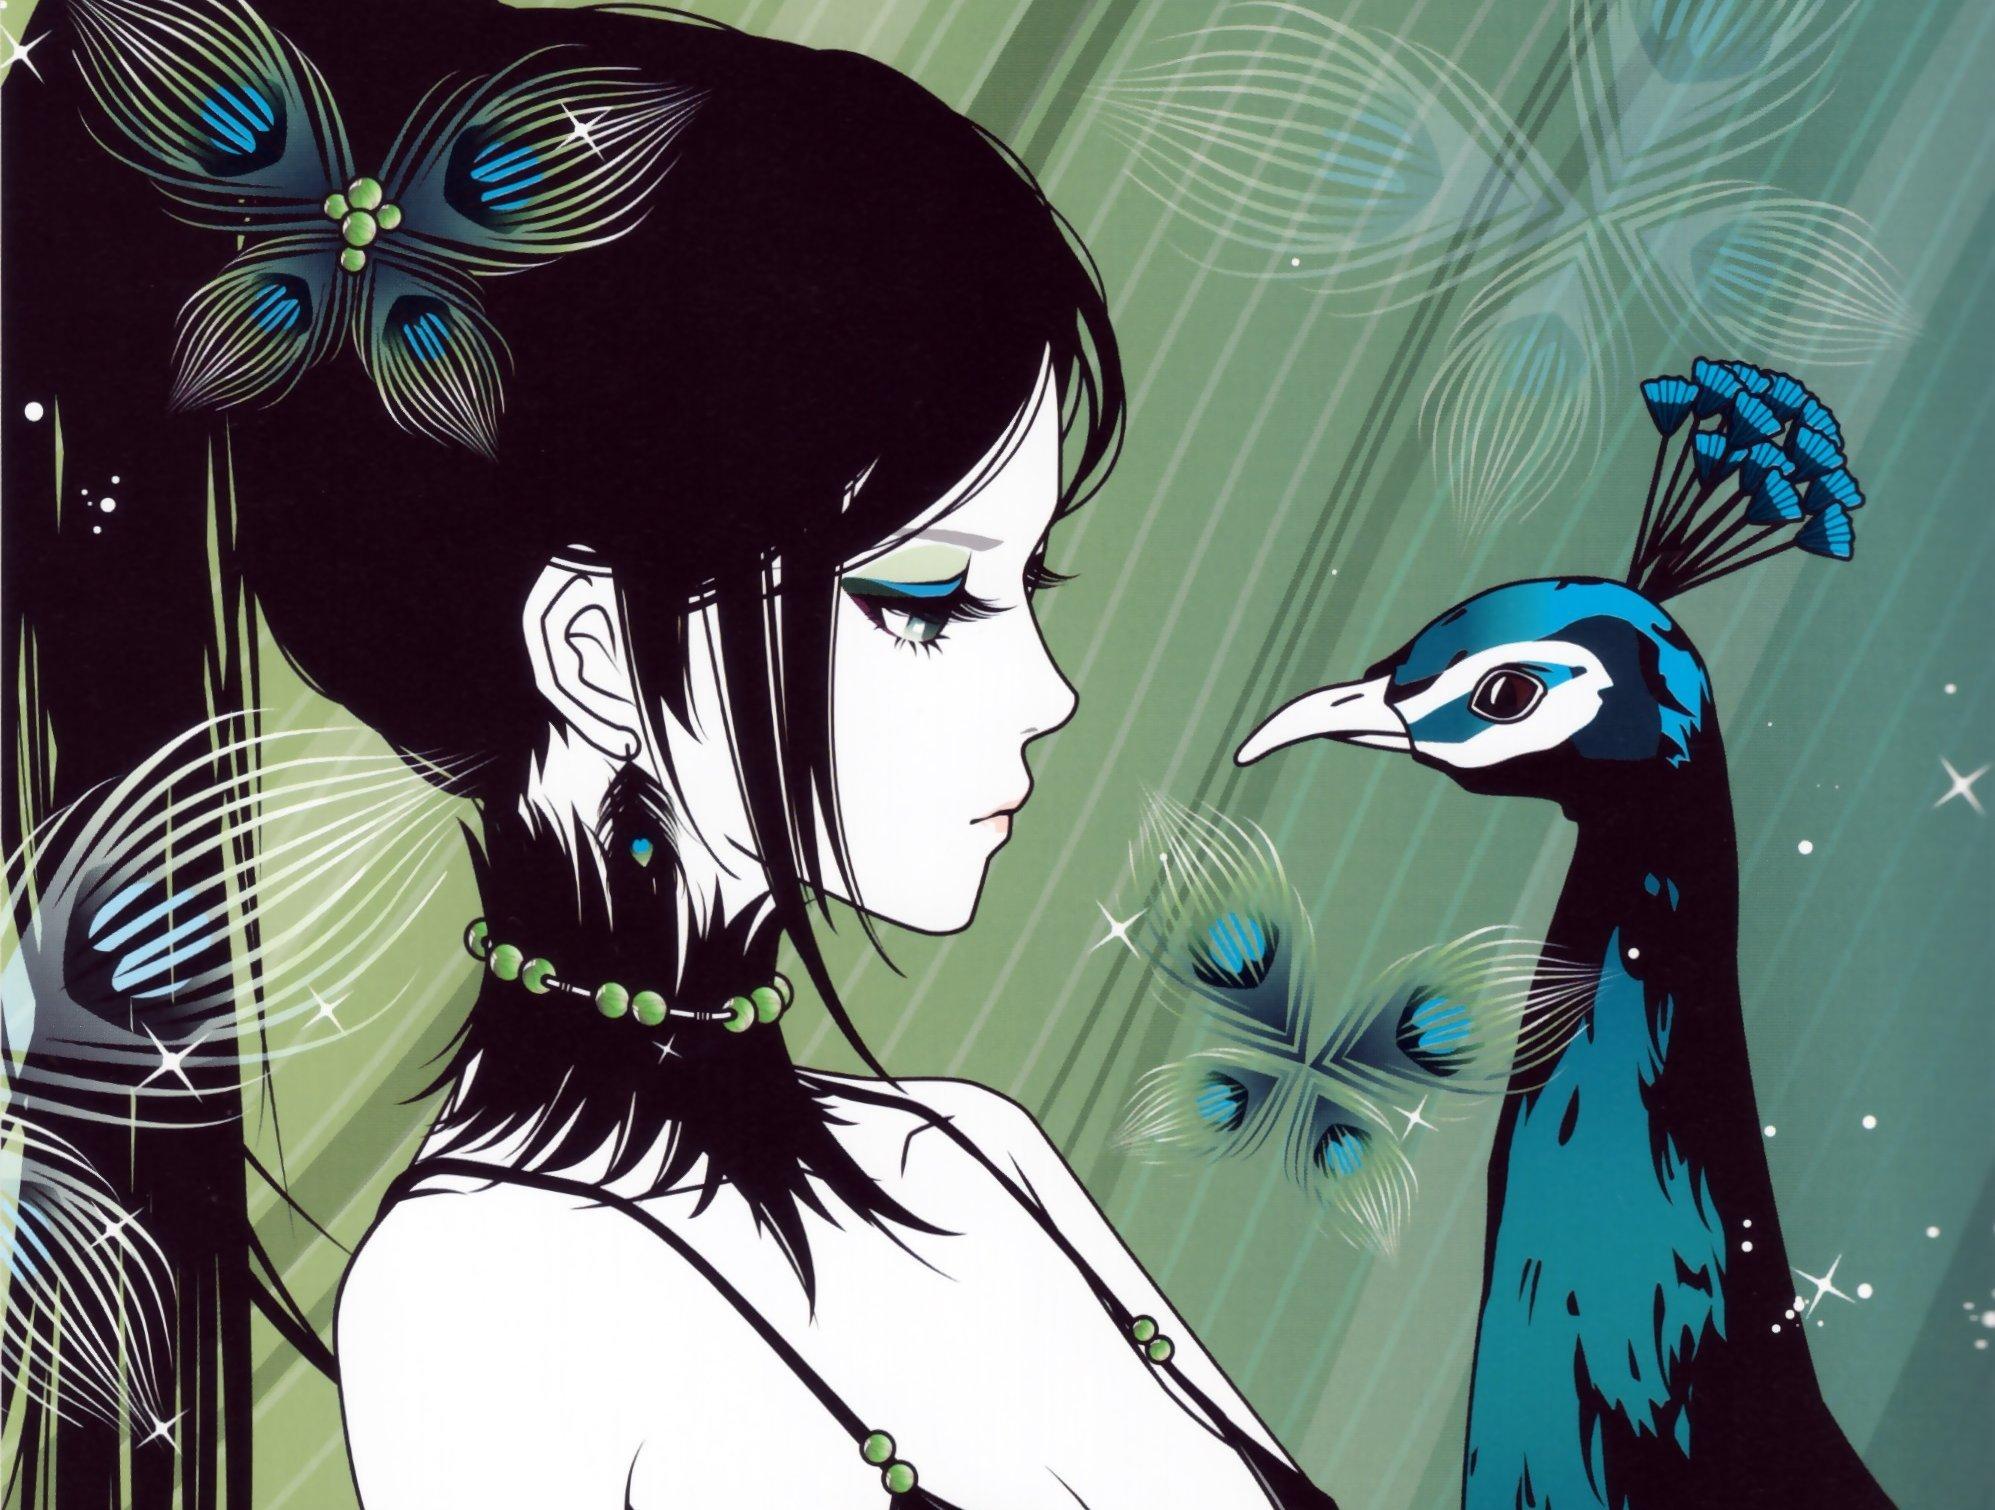 Kawaii Anime Girl Iphone Wallpaper Original Full Hd Wallpaper And Background Image